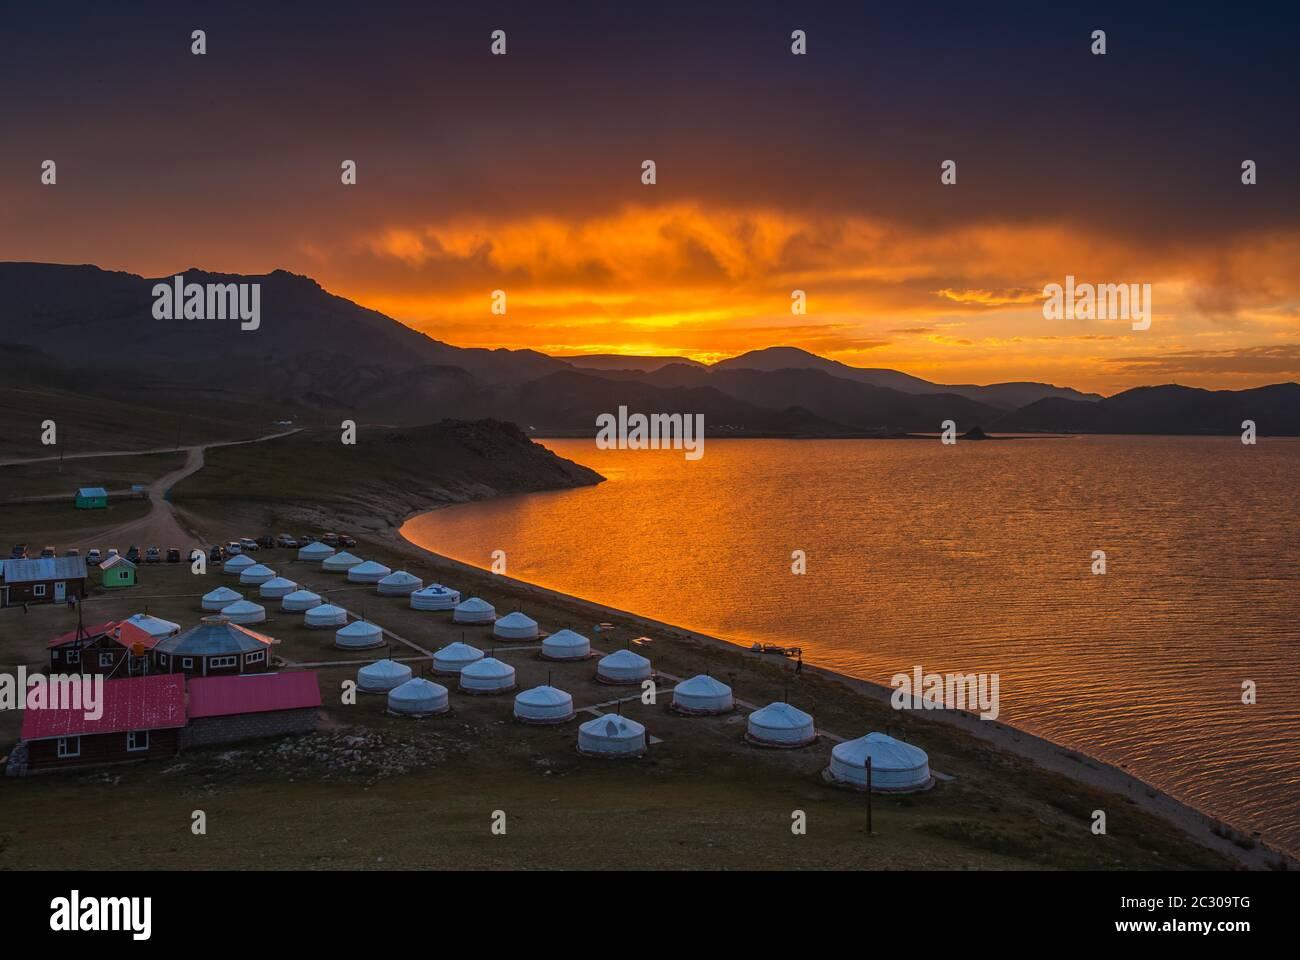 Sonnenaufgang am Weißen Terkh See, ger, Nomadenzelt, Resort am Ufer des Sees, Arkhangai Provinz, Mongolei Stockfoto